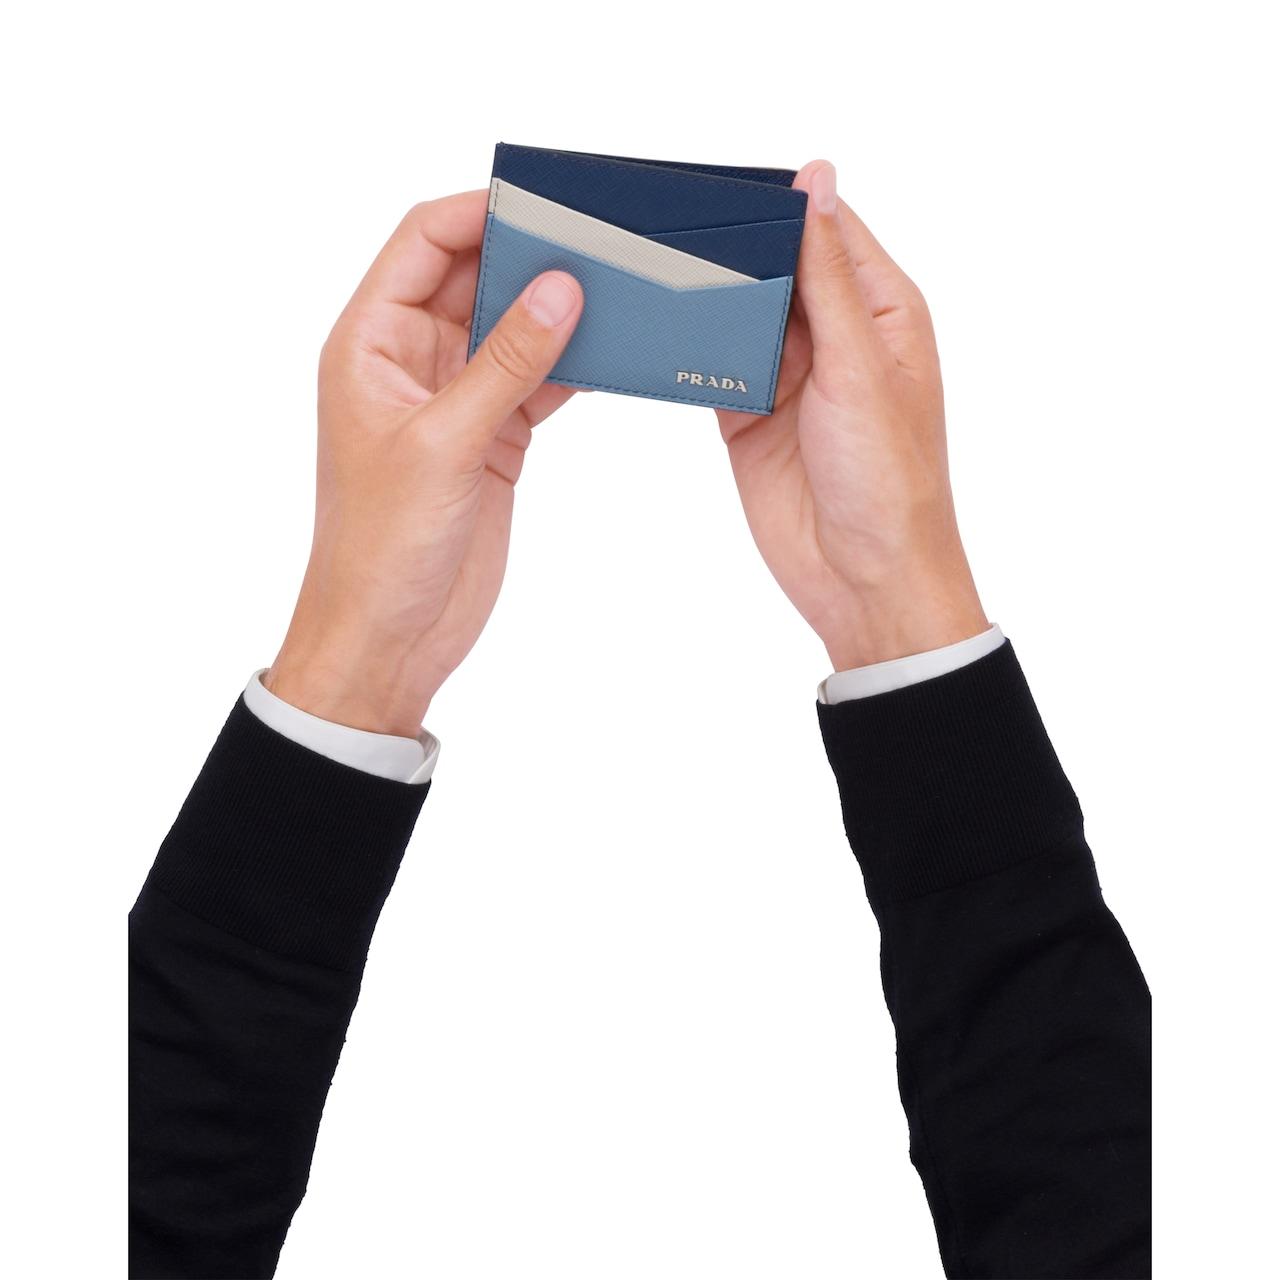 Prada Saffiano leather card holder 2